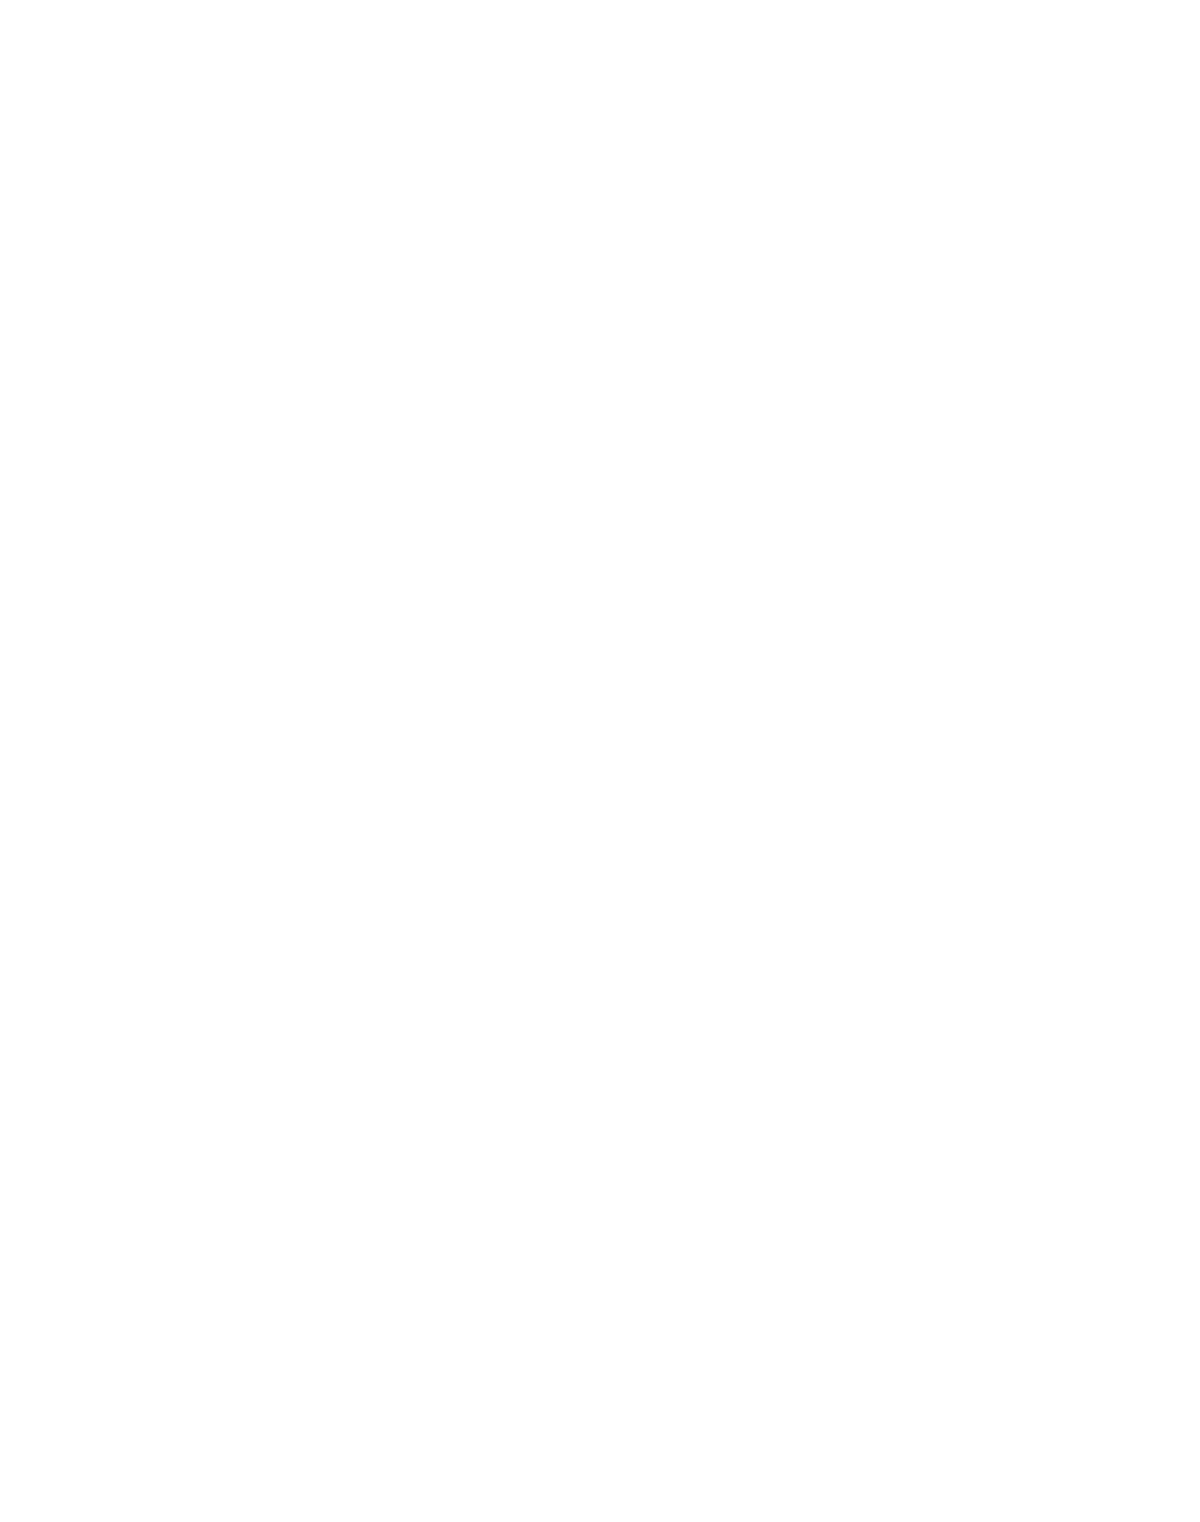 Mussola di cotone Pacco da 3 tonalità rosa